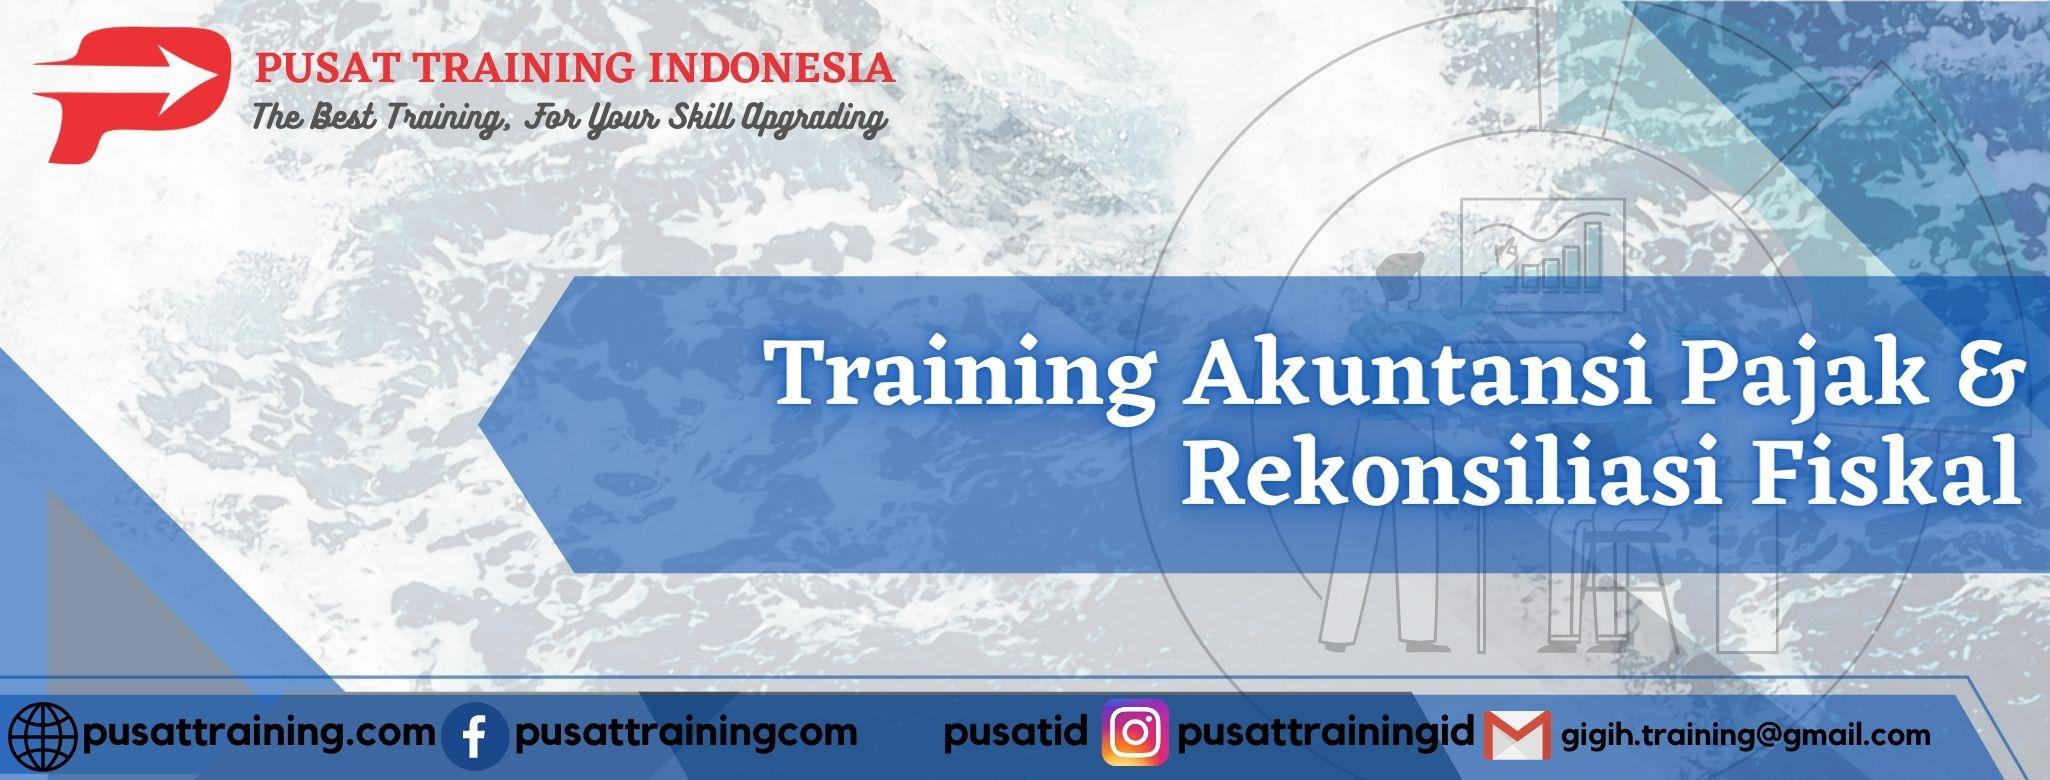 Training-Akuntansi-Pajak-Rekonsiliasi-Fiskal